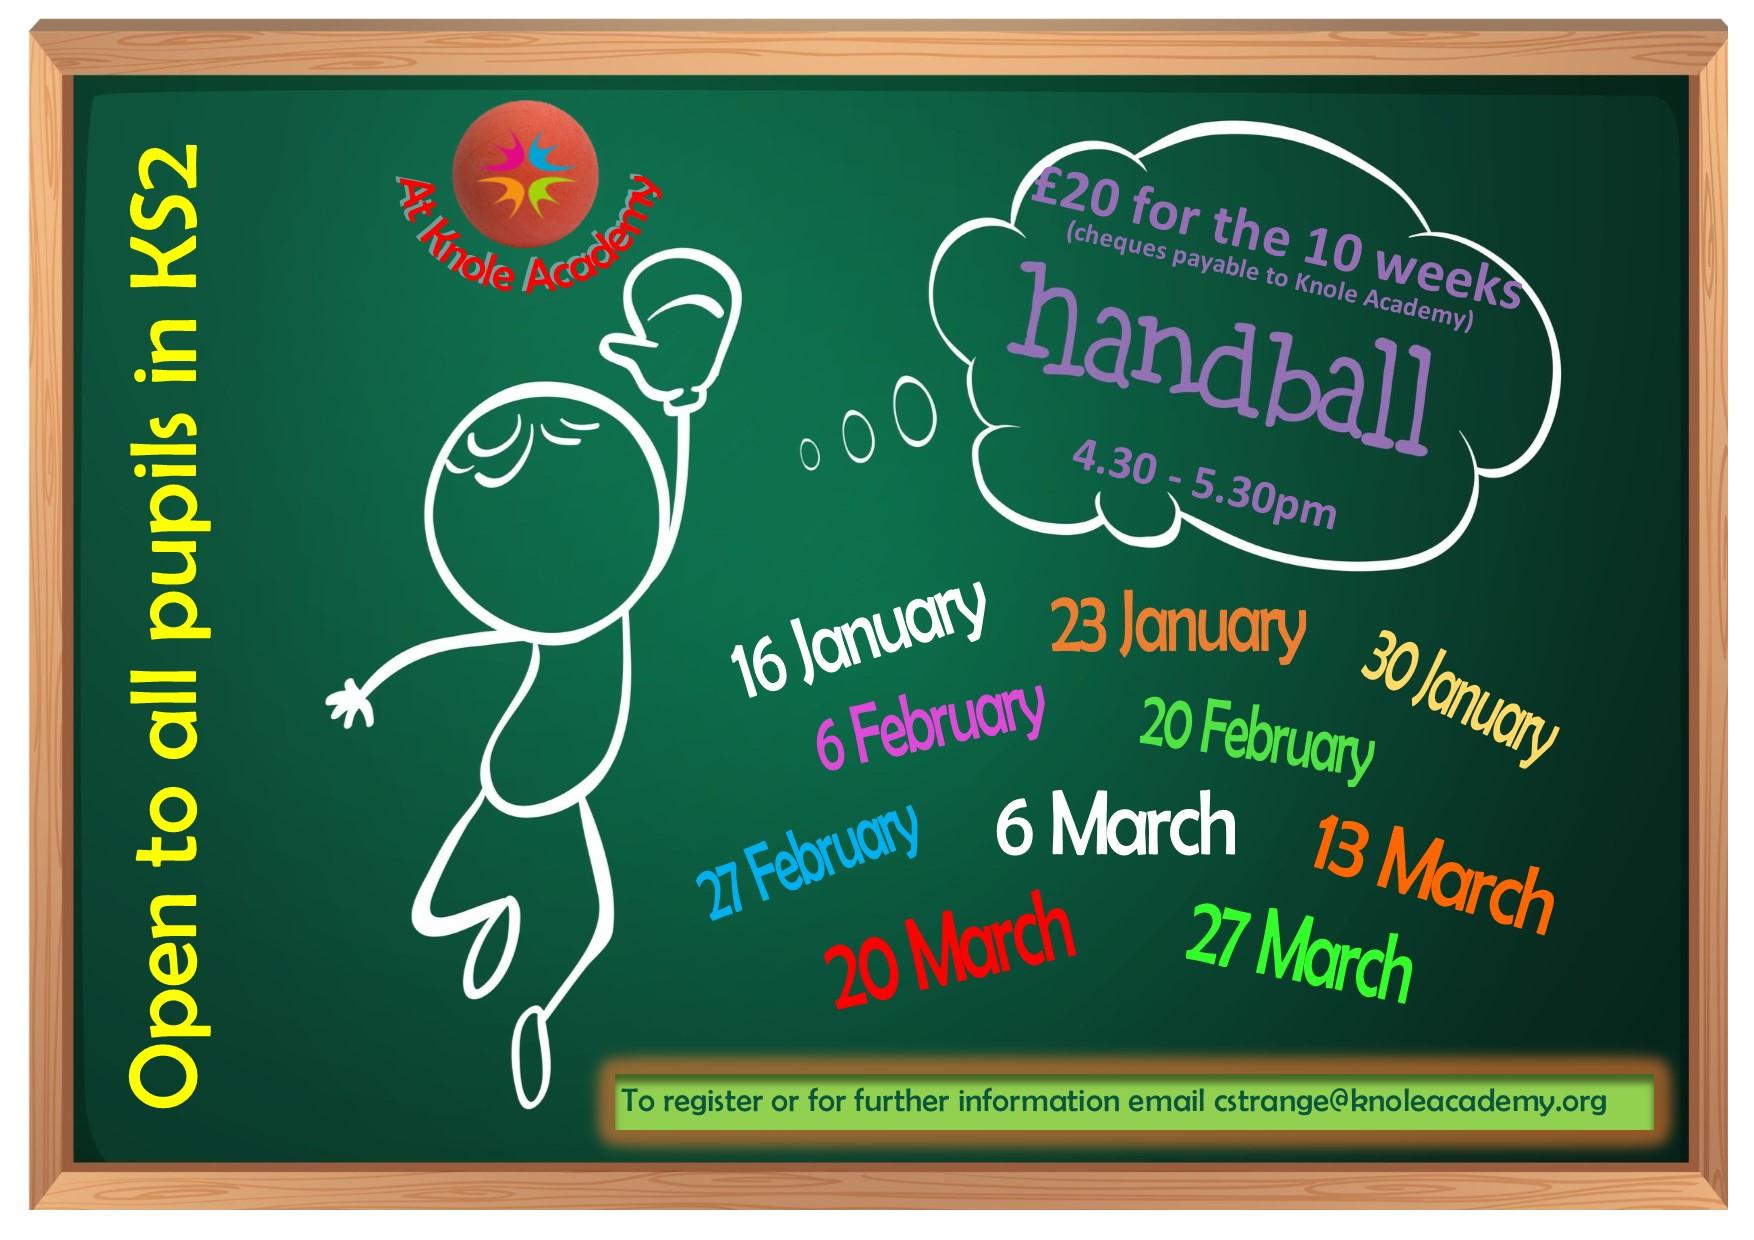 Poster for handball Term 3 & 4